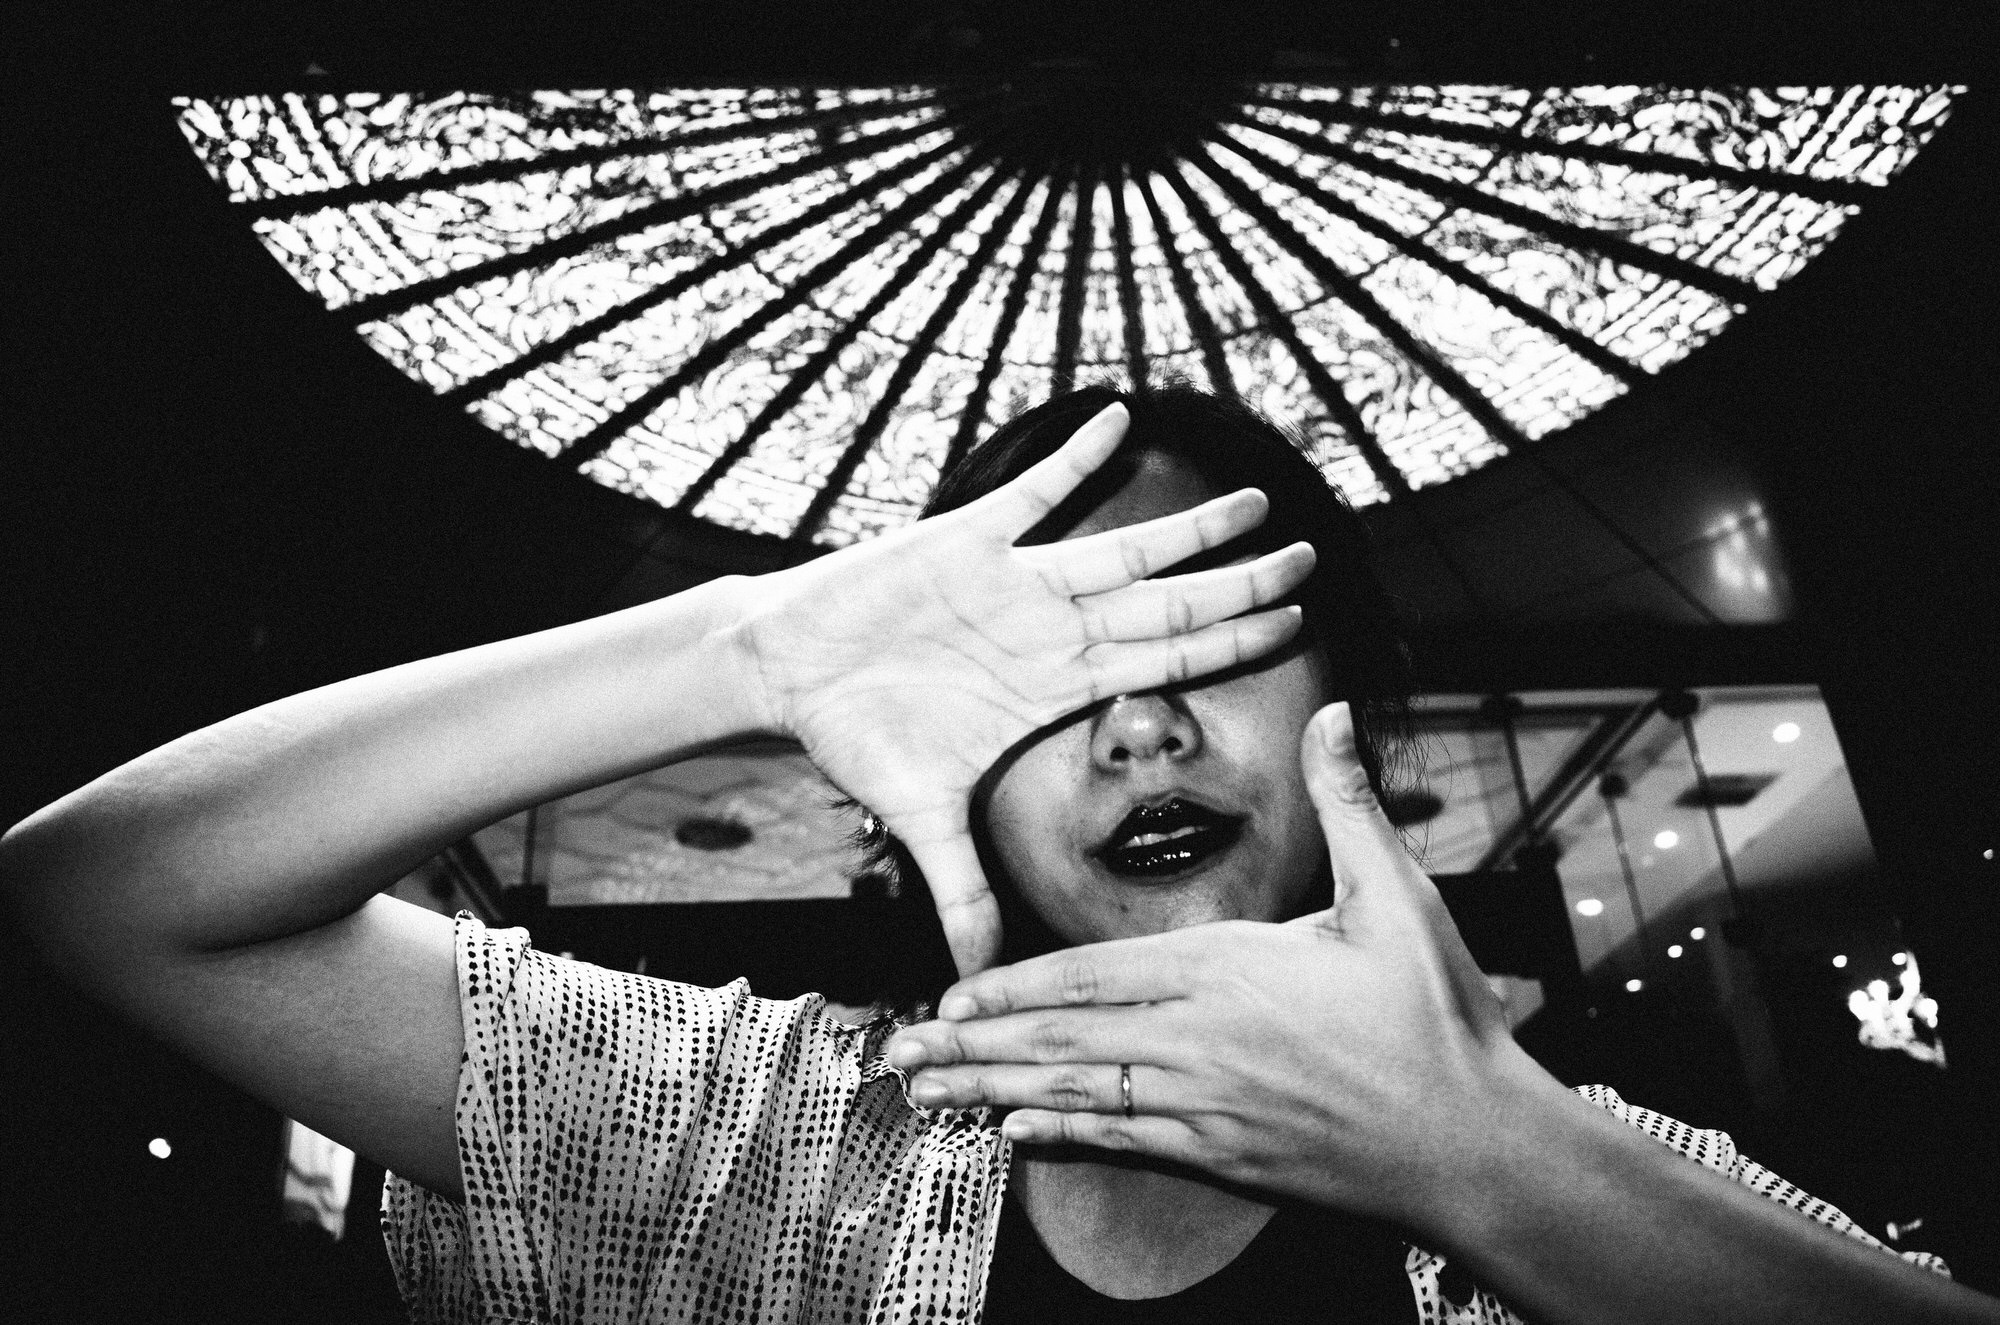 001 ERIC KIM PHOTOGRAPHY00021